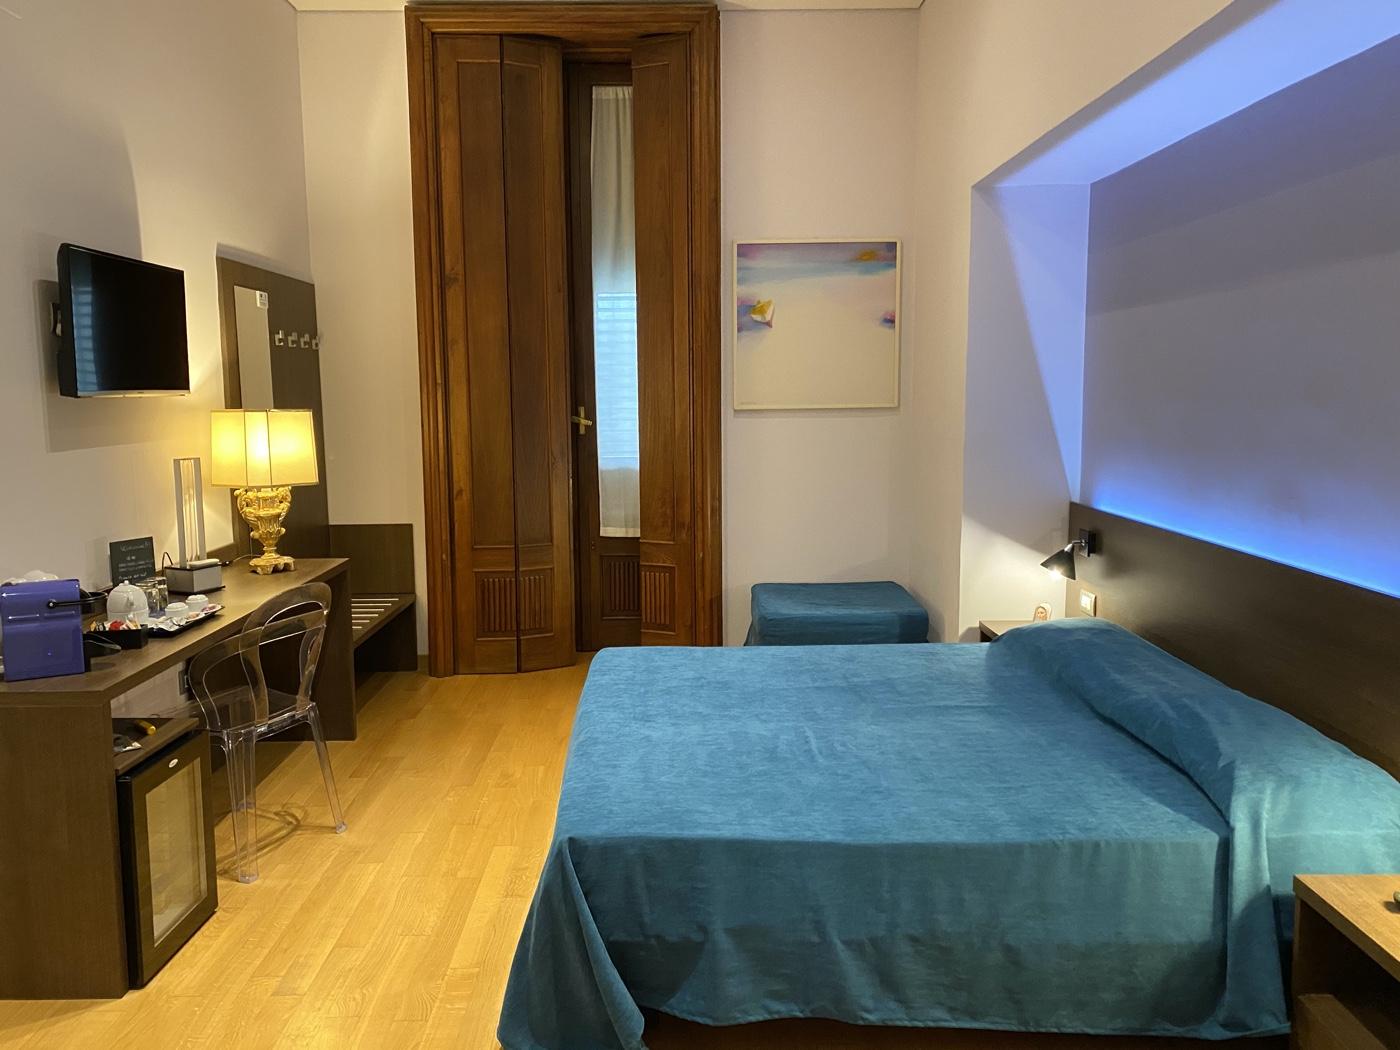 camera matrimoniale Boutique Hotel Liddo Barletta